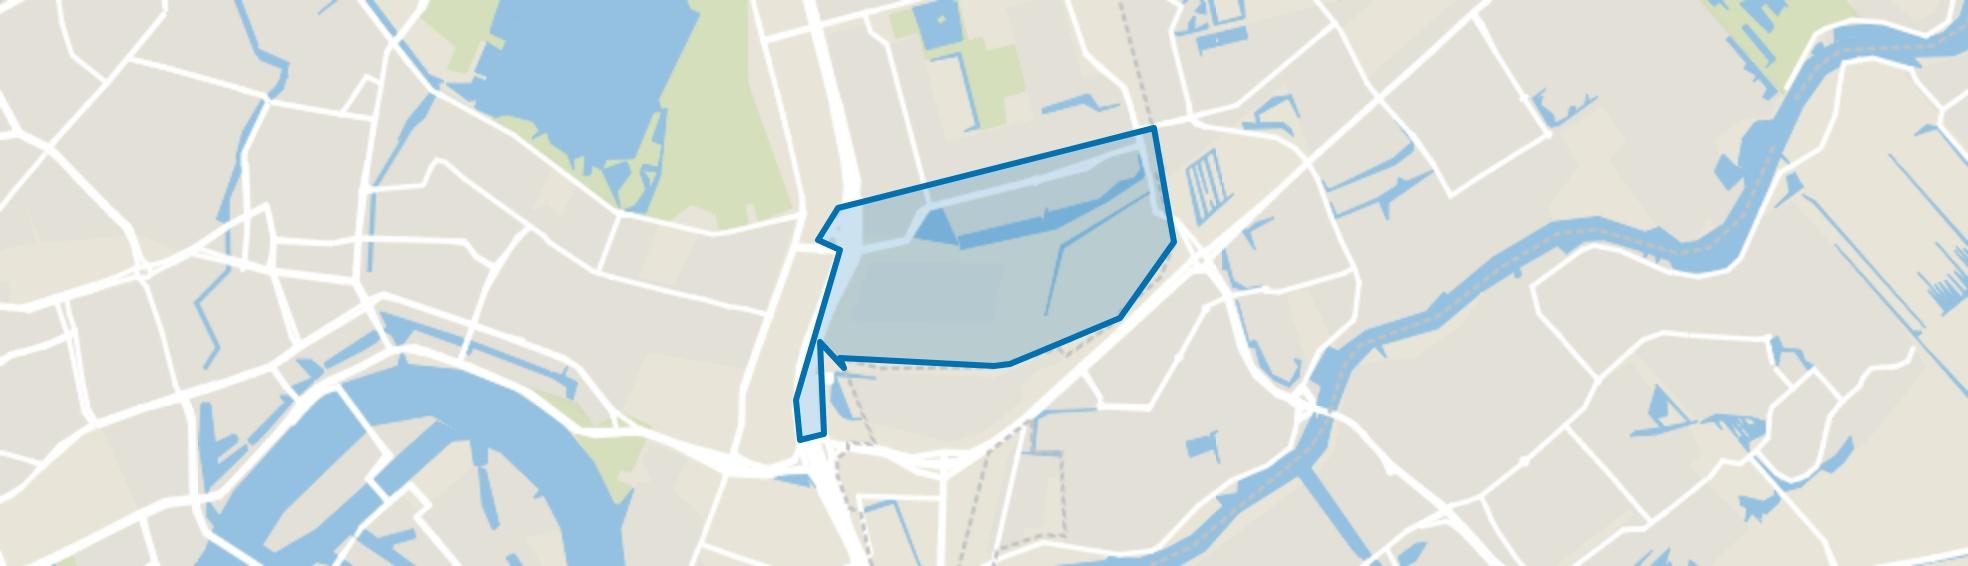 's-Gravenland, Rotterdam map